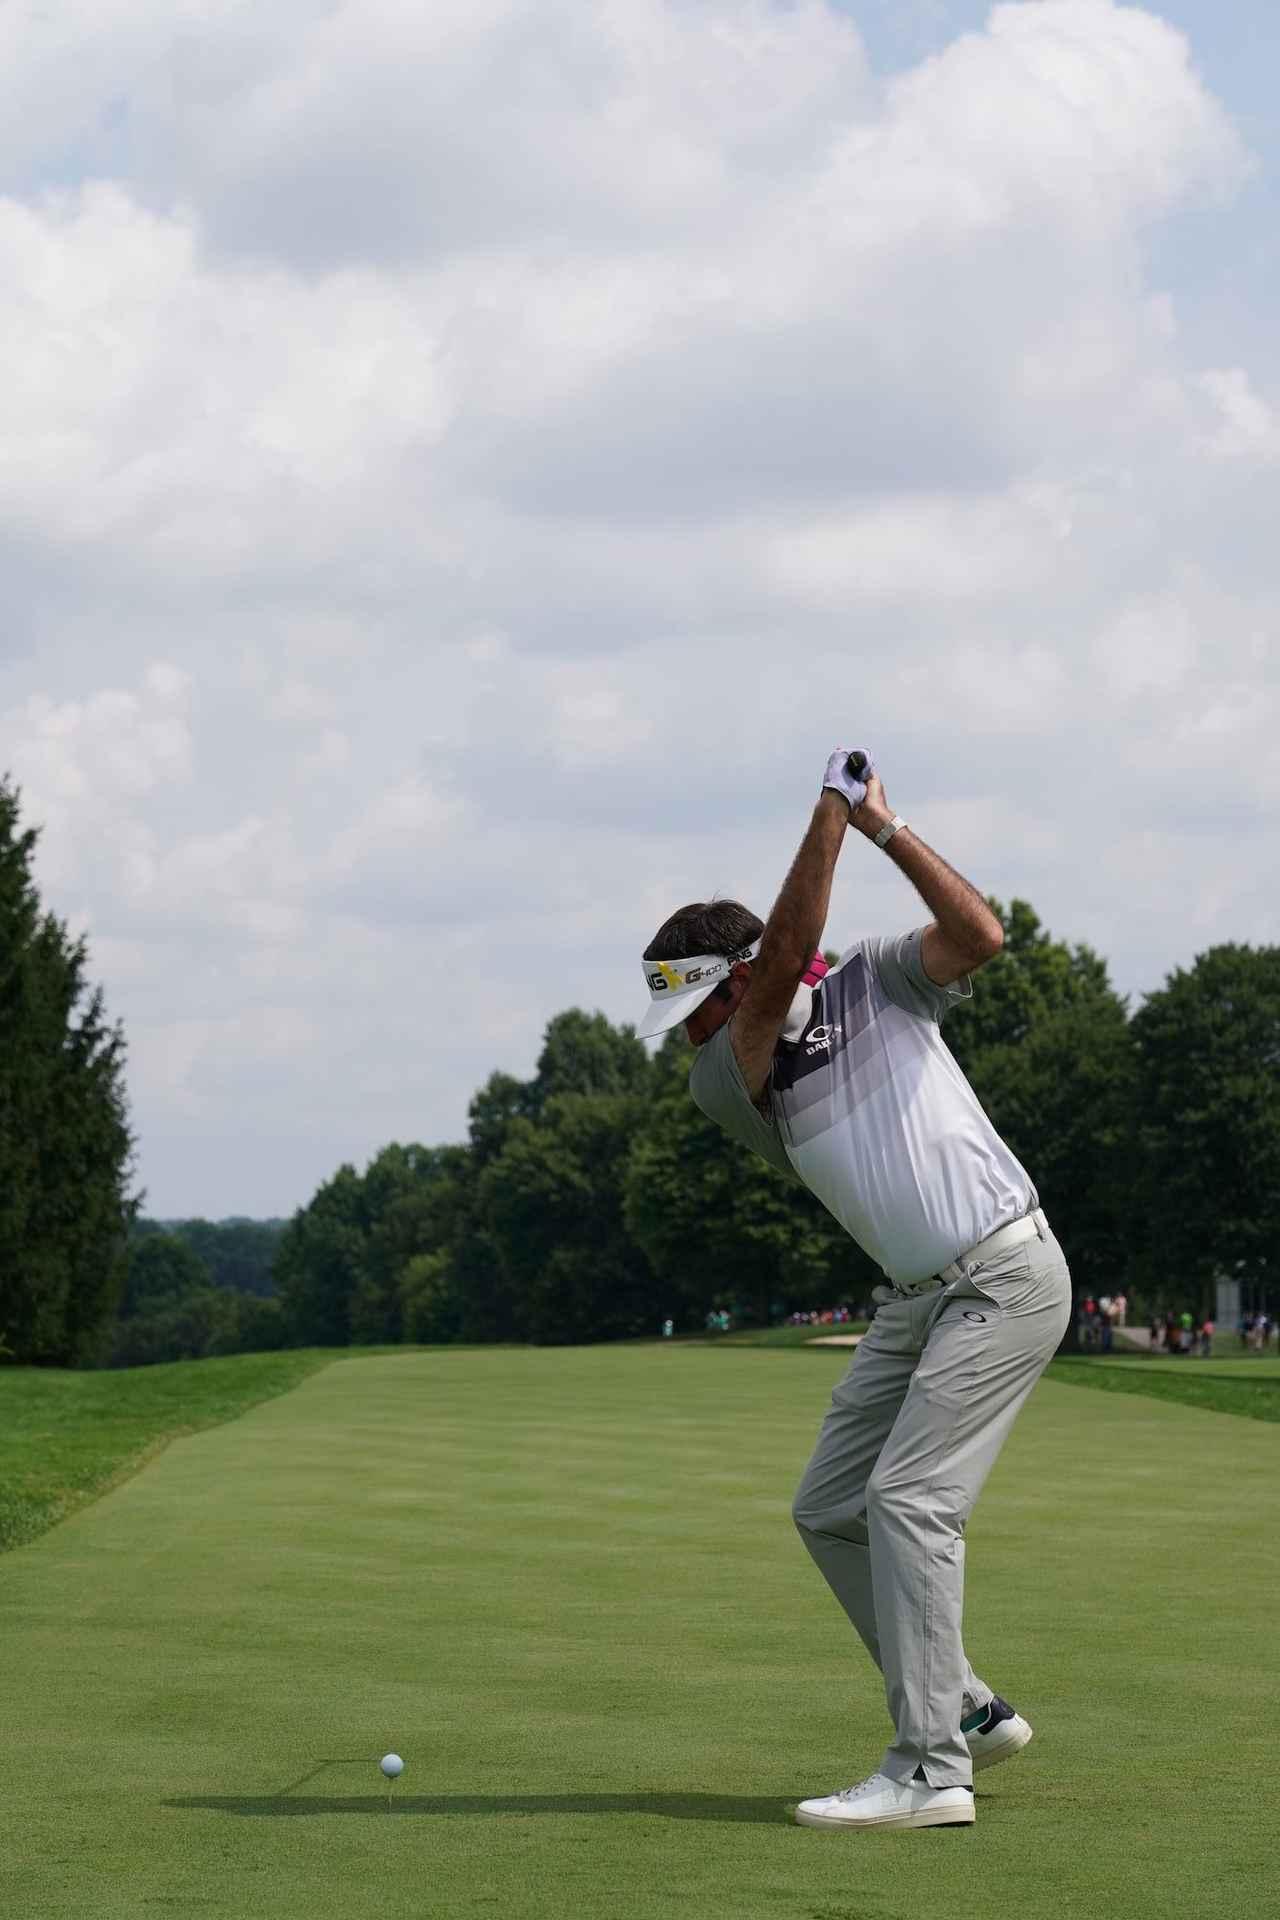 Images : 12番目の画像 - 強烈! バッバ・ワトソンのドライバーショット - みんなのゴルフダイジェスト